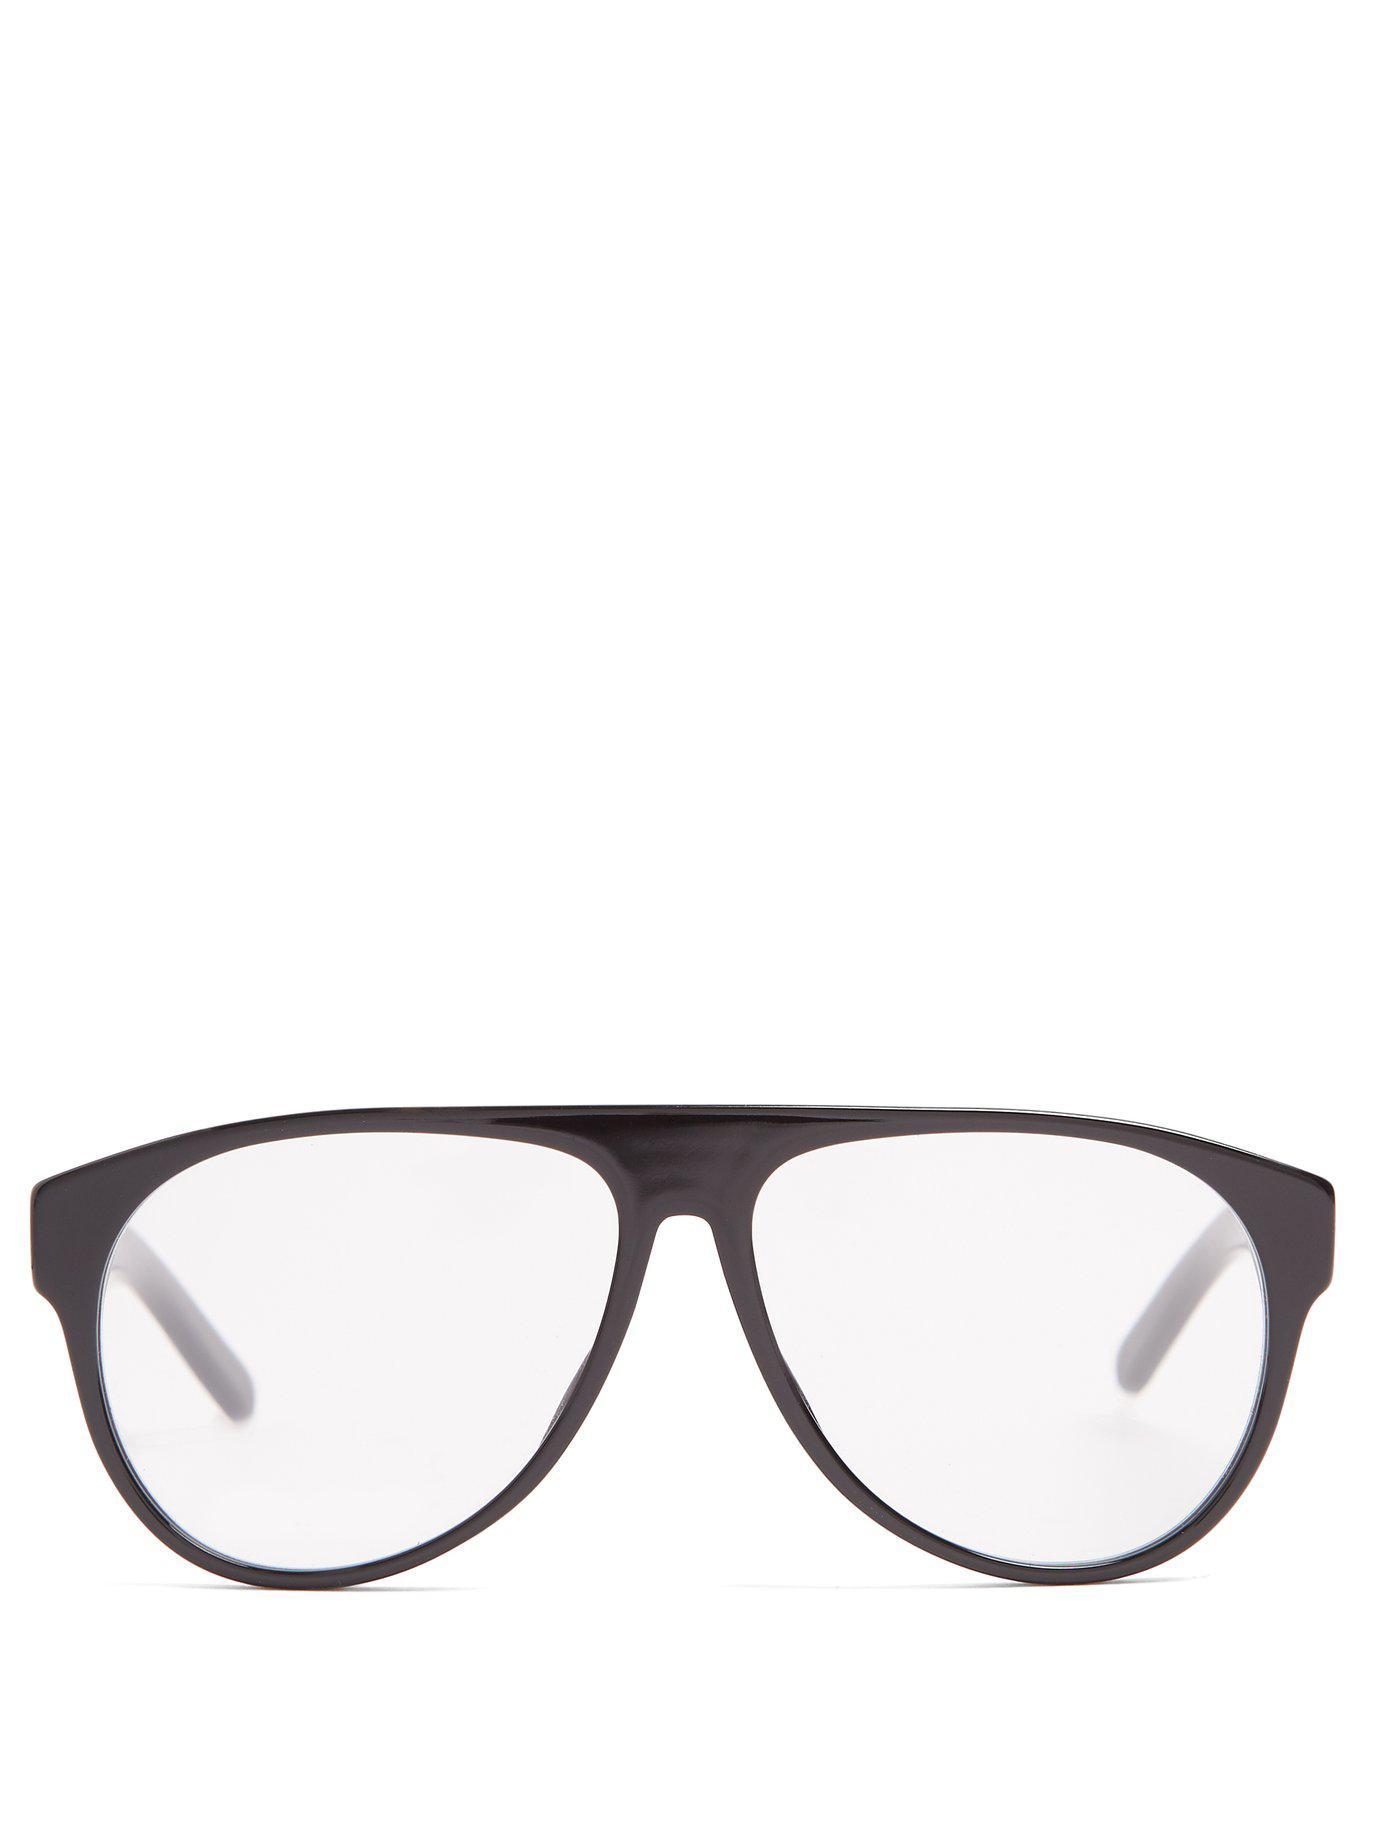 b8d56c7de8a Lyst - Dior Homme Aviator Acetate Glasses in Black for Men